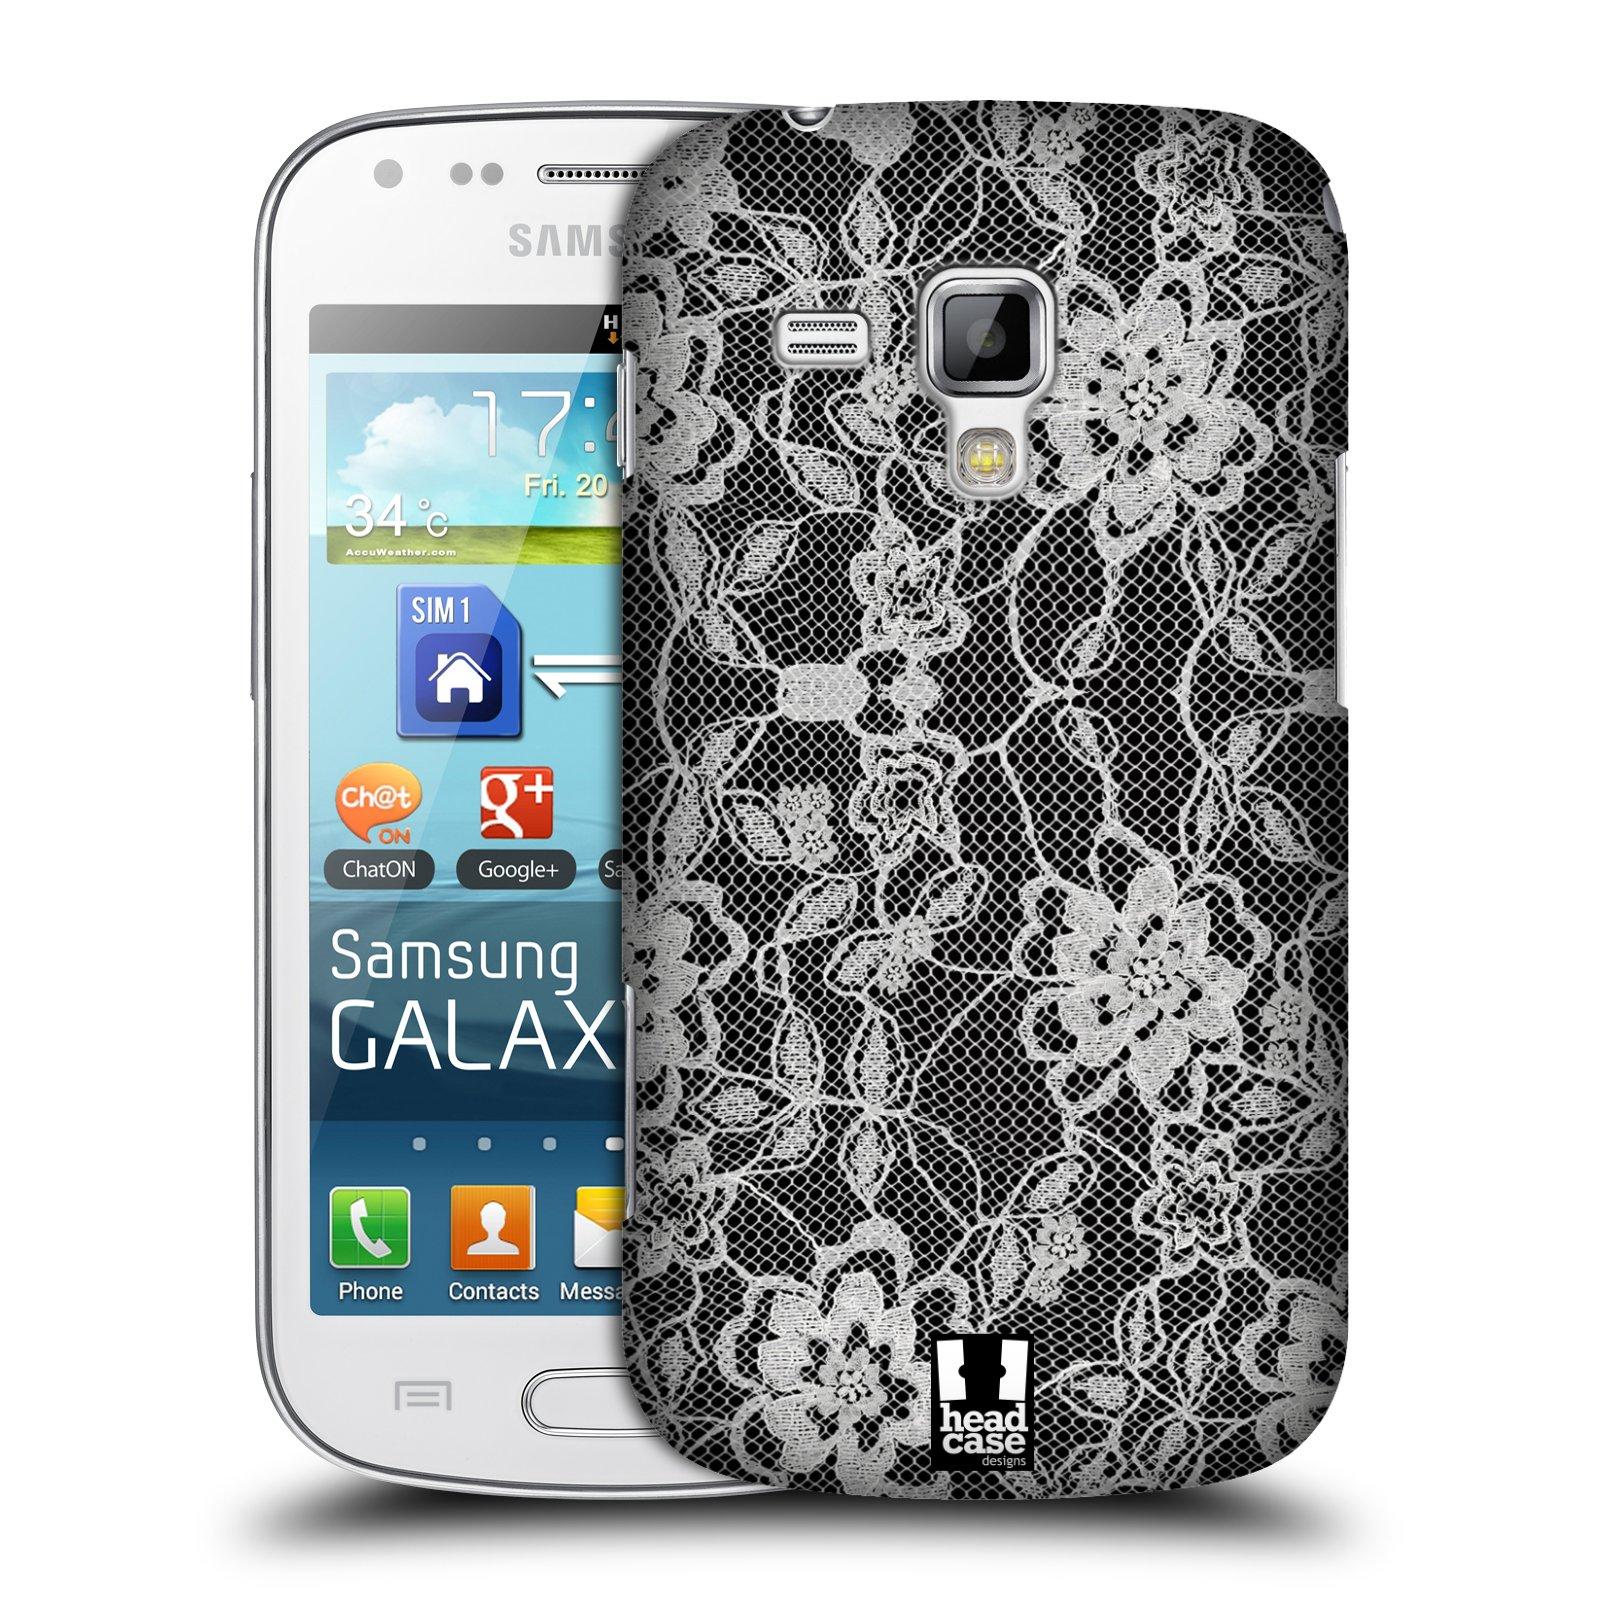 Plastové pouzdro na mobil Samsung Galaxy S Duos HEAD CASE FLOWERY KRAJKA (Kryt či obal na mobilní telefon Samsung Galaxy S Duos GT-S7562)